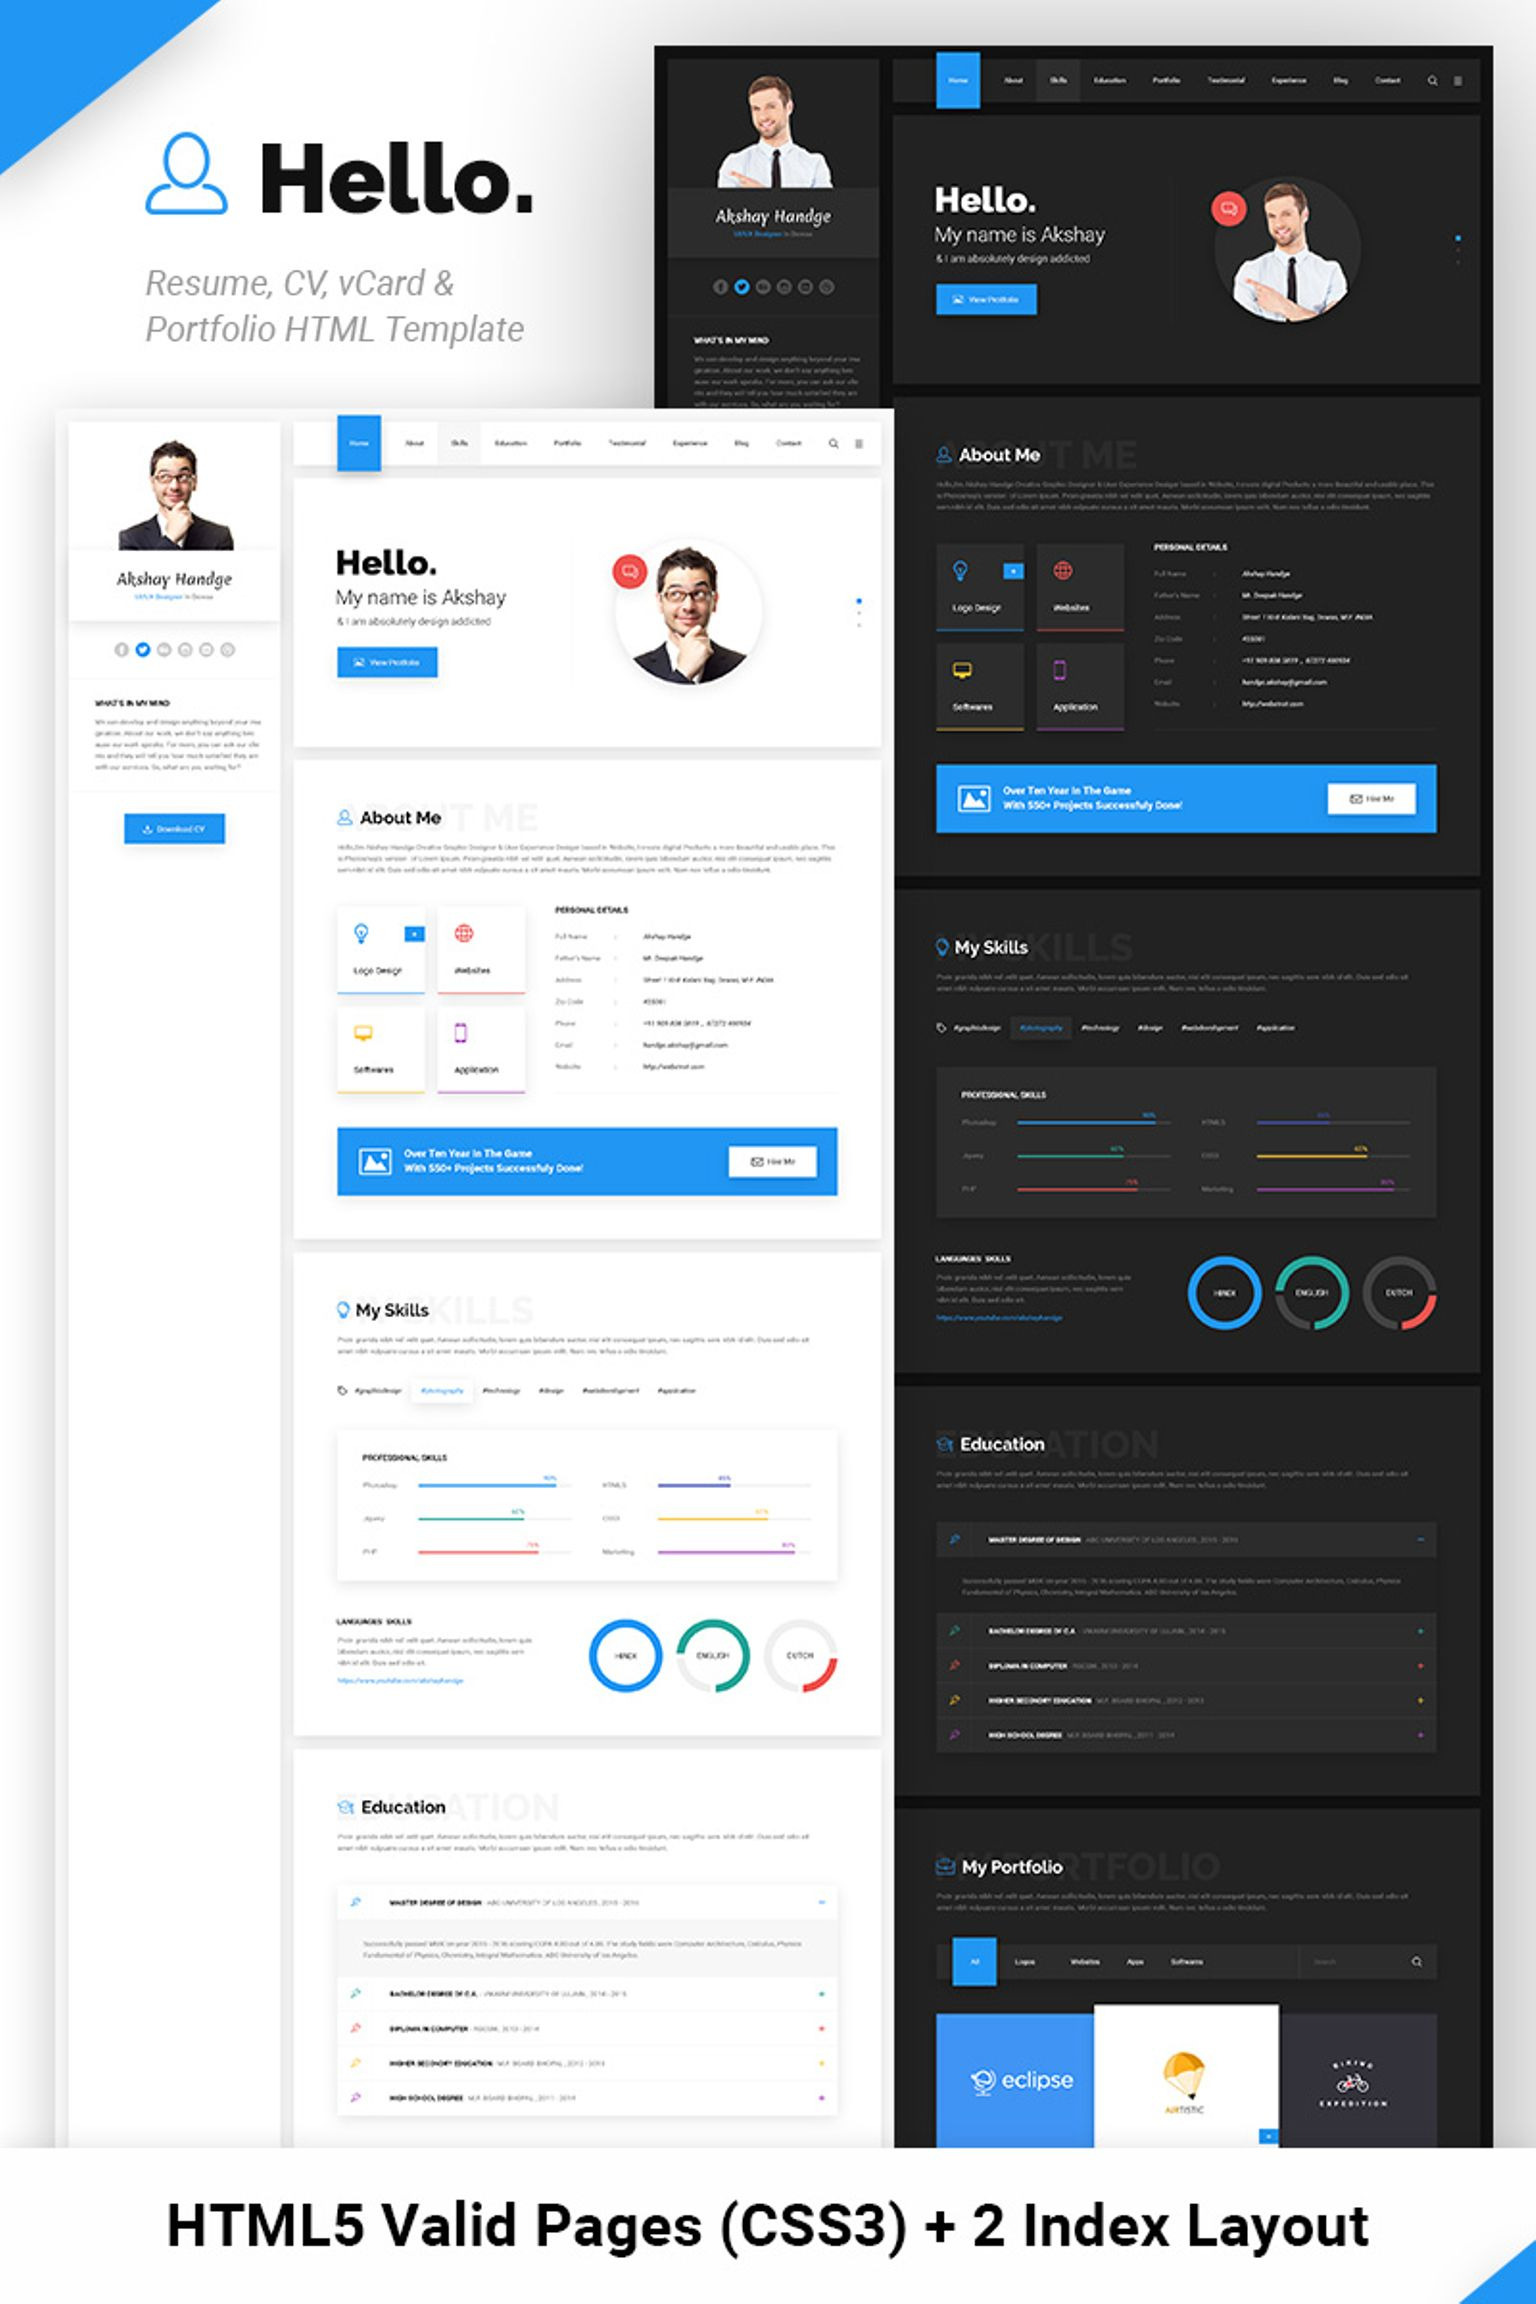 Hello Resume Cv Vcard Portfolio Html Template Website